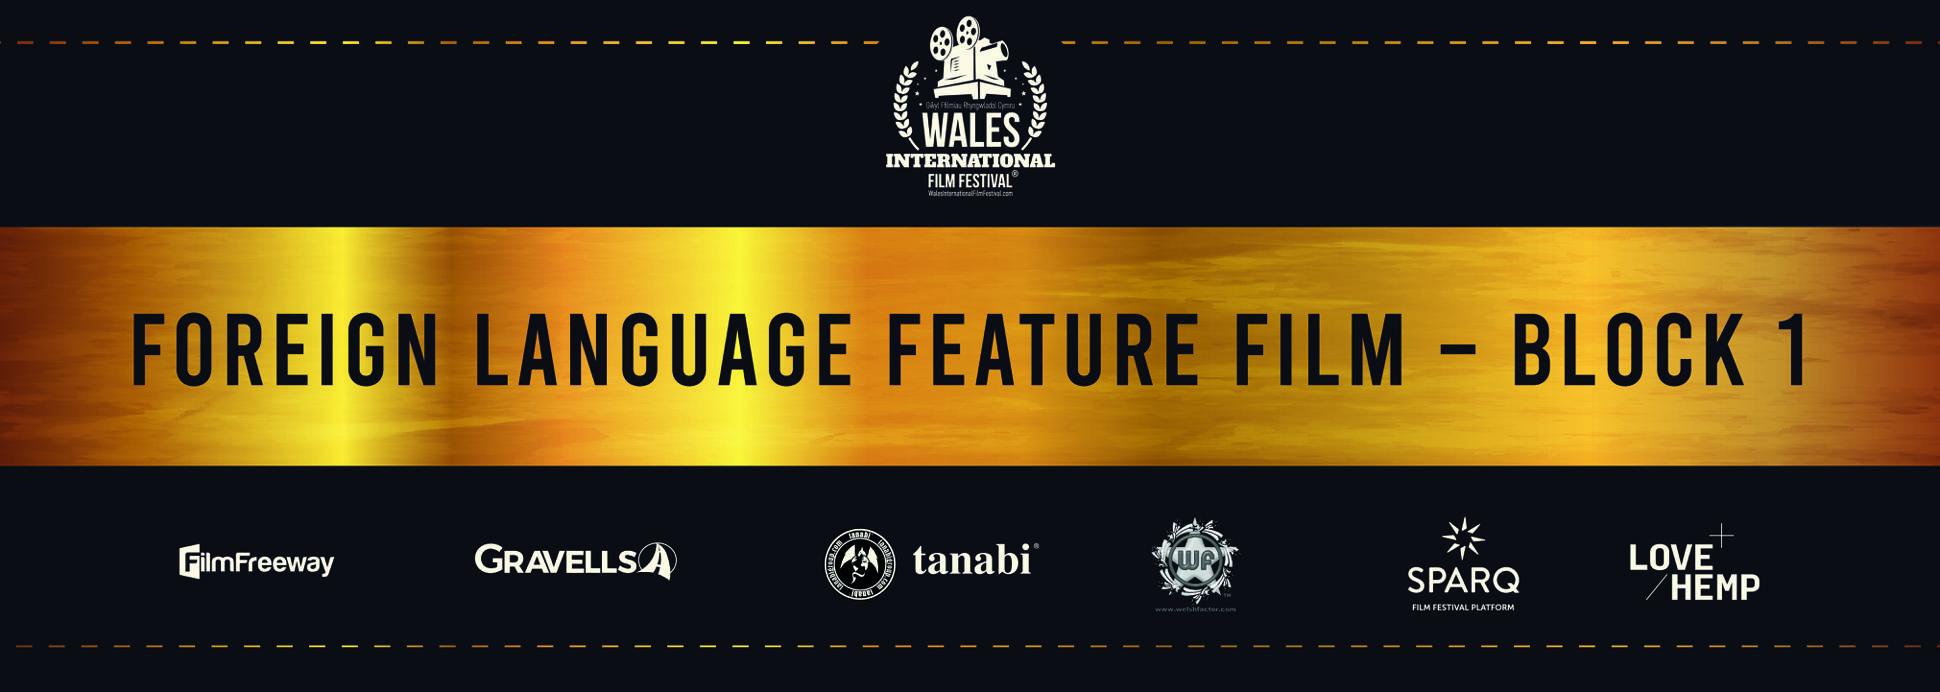 Foreign Language Feature Film - Block 1